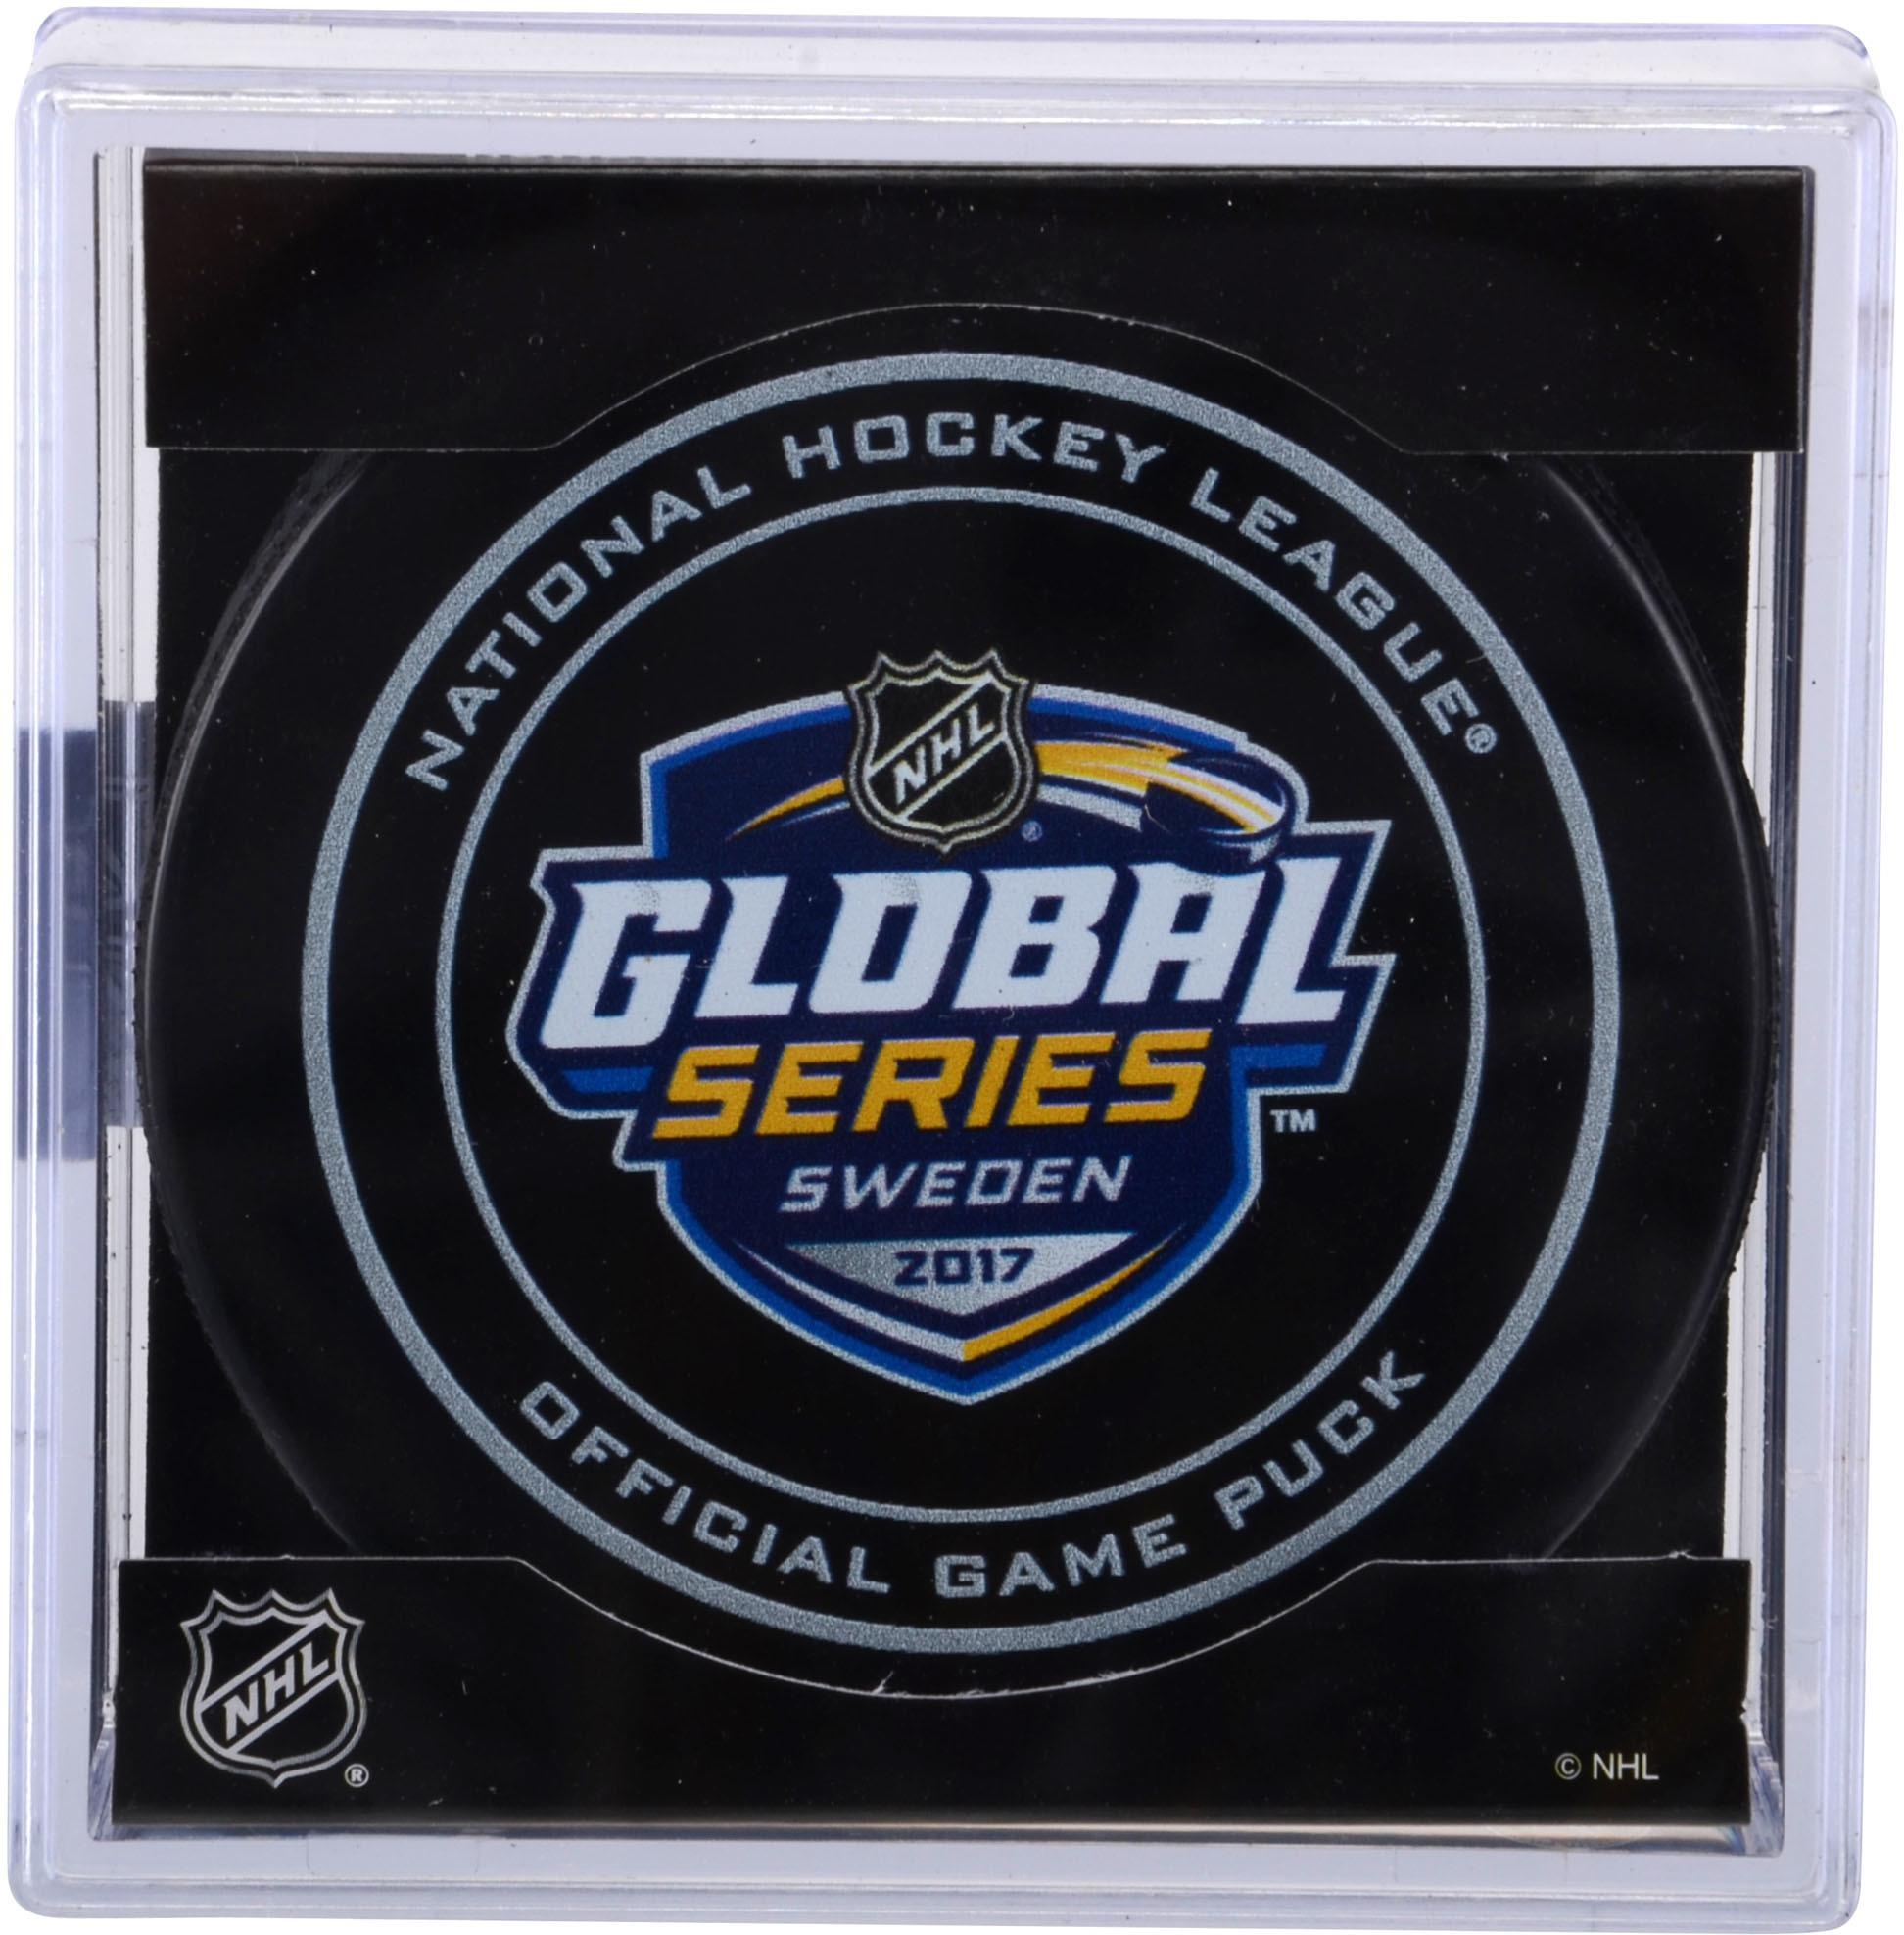 Colorado Avalanche vs. Ottawa Senators 2017 NHL Global Series Unsigned Official Game Puck